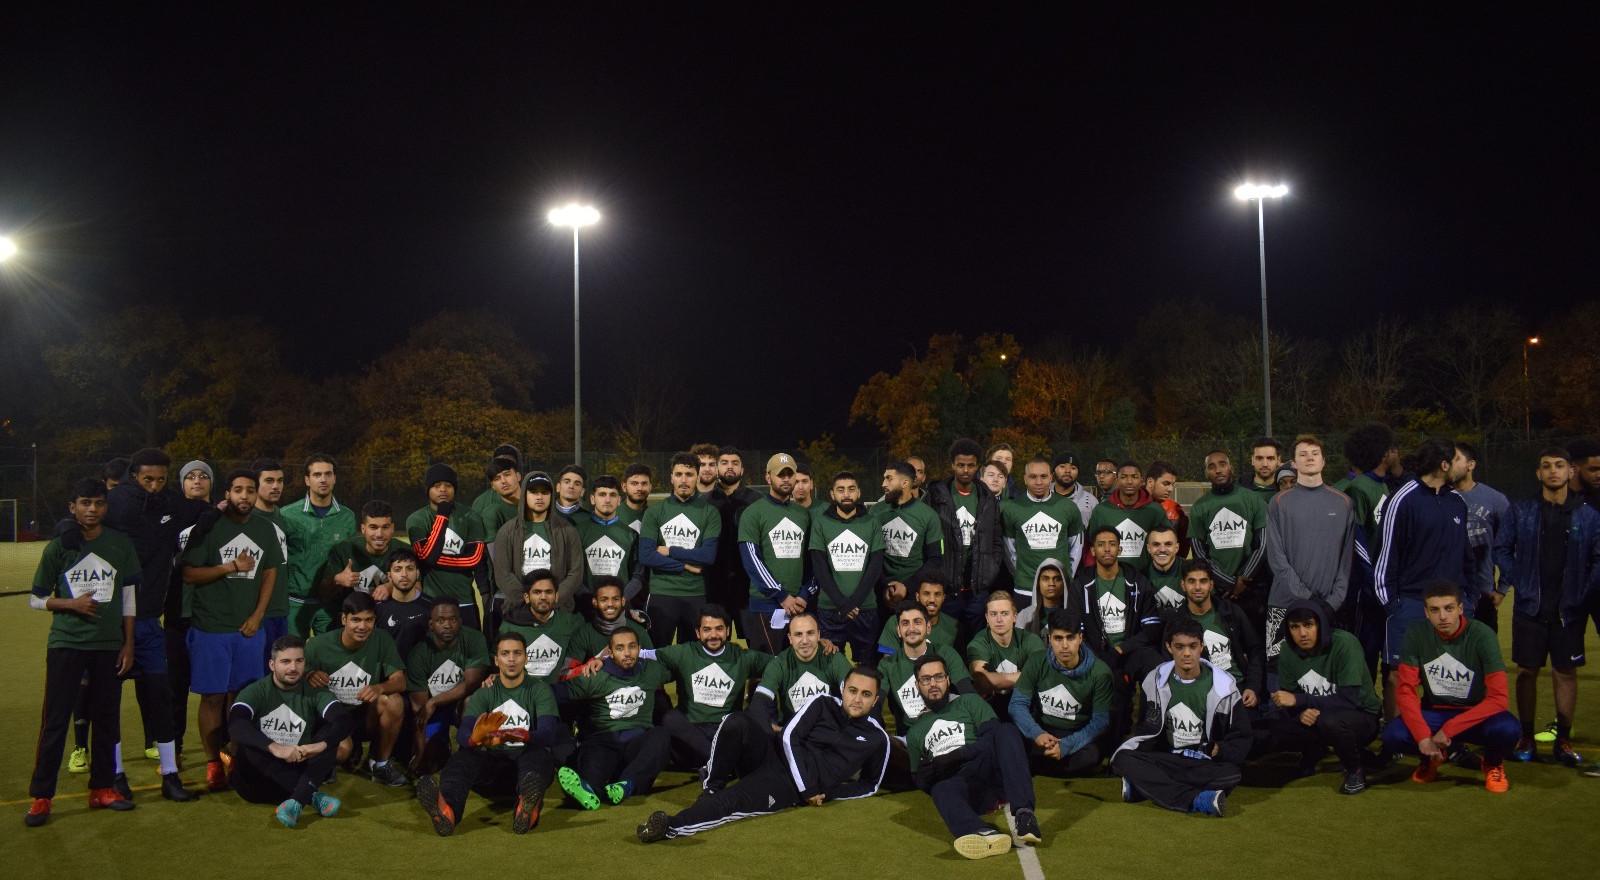 IAM Charity Football Tournamnet